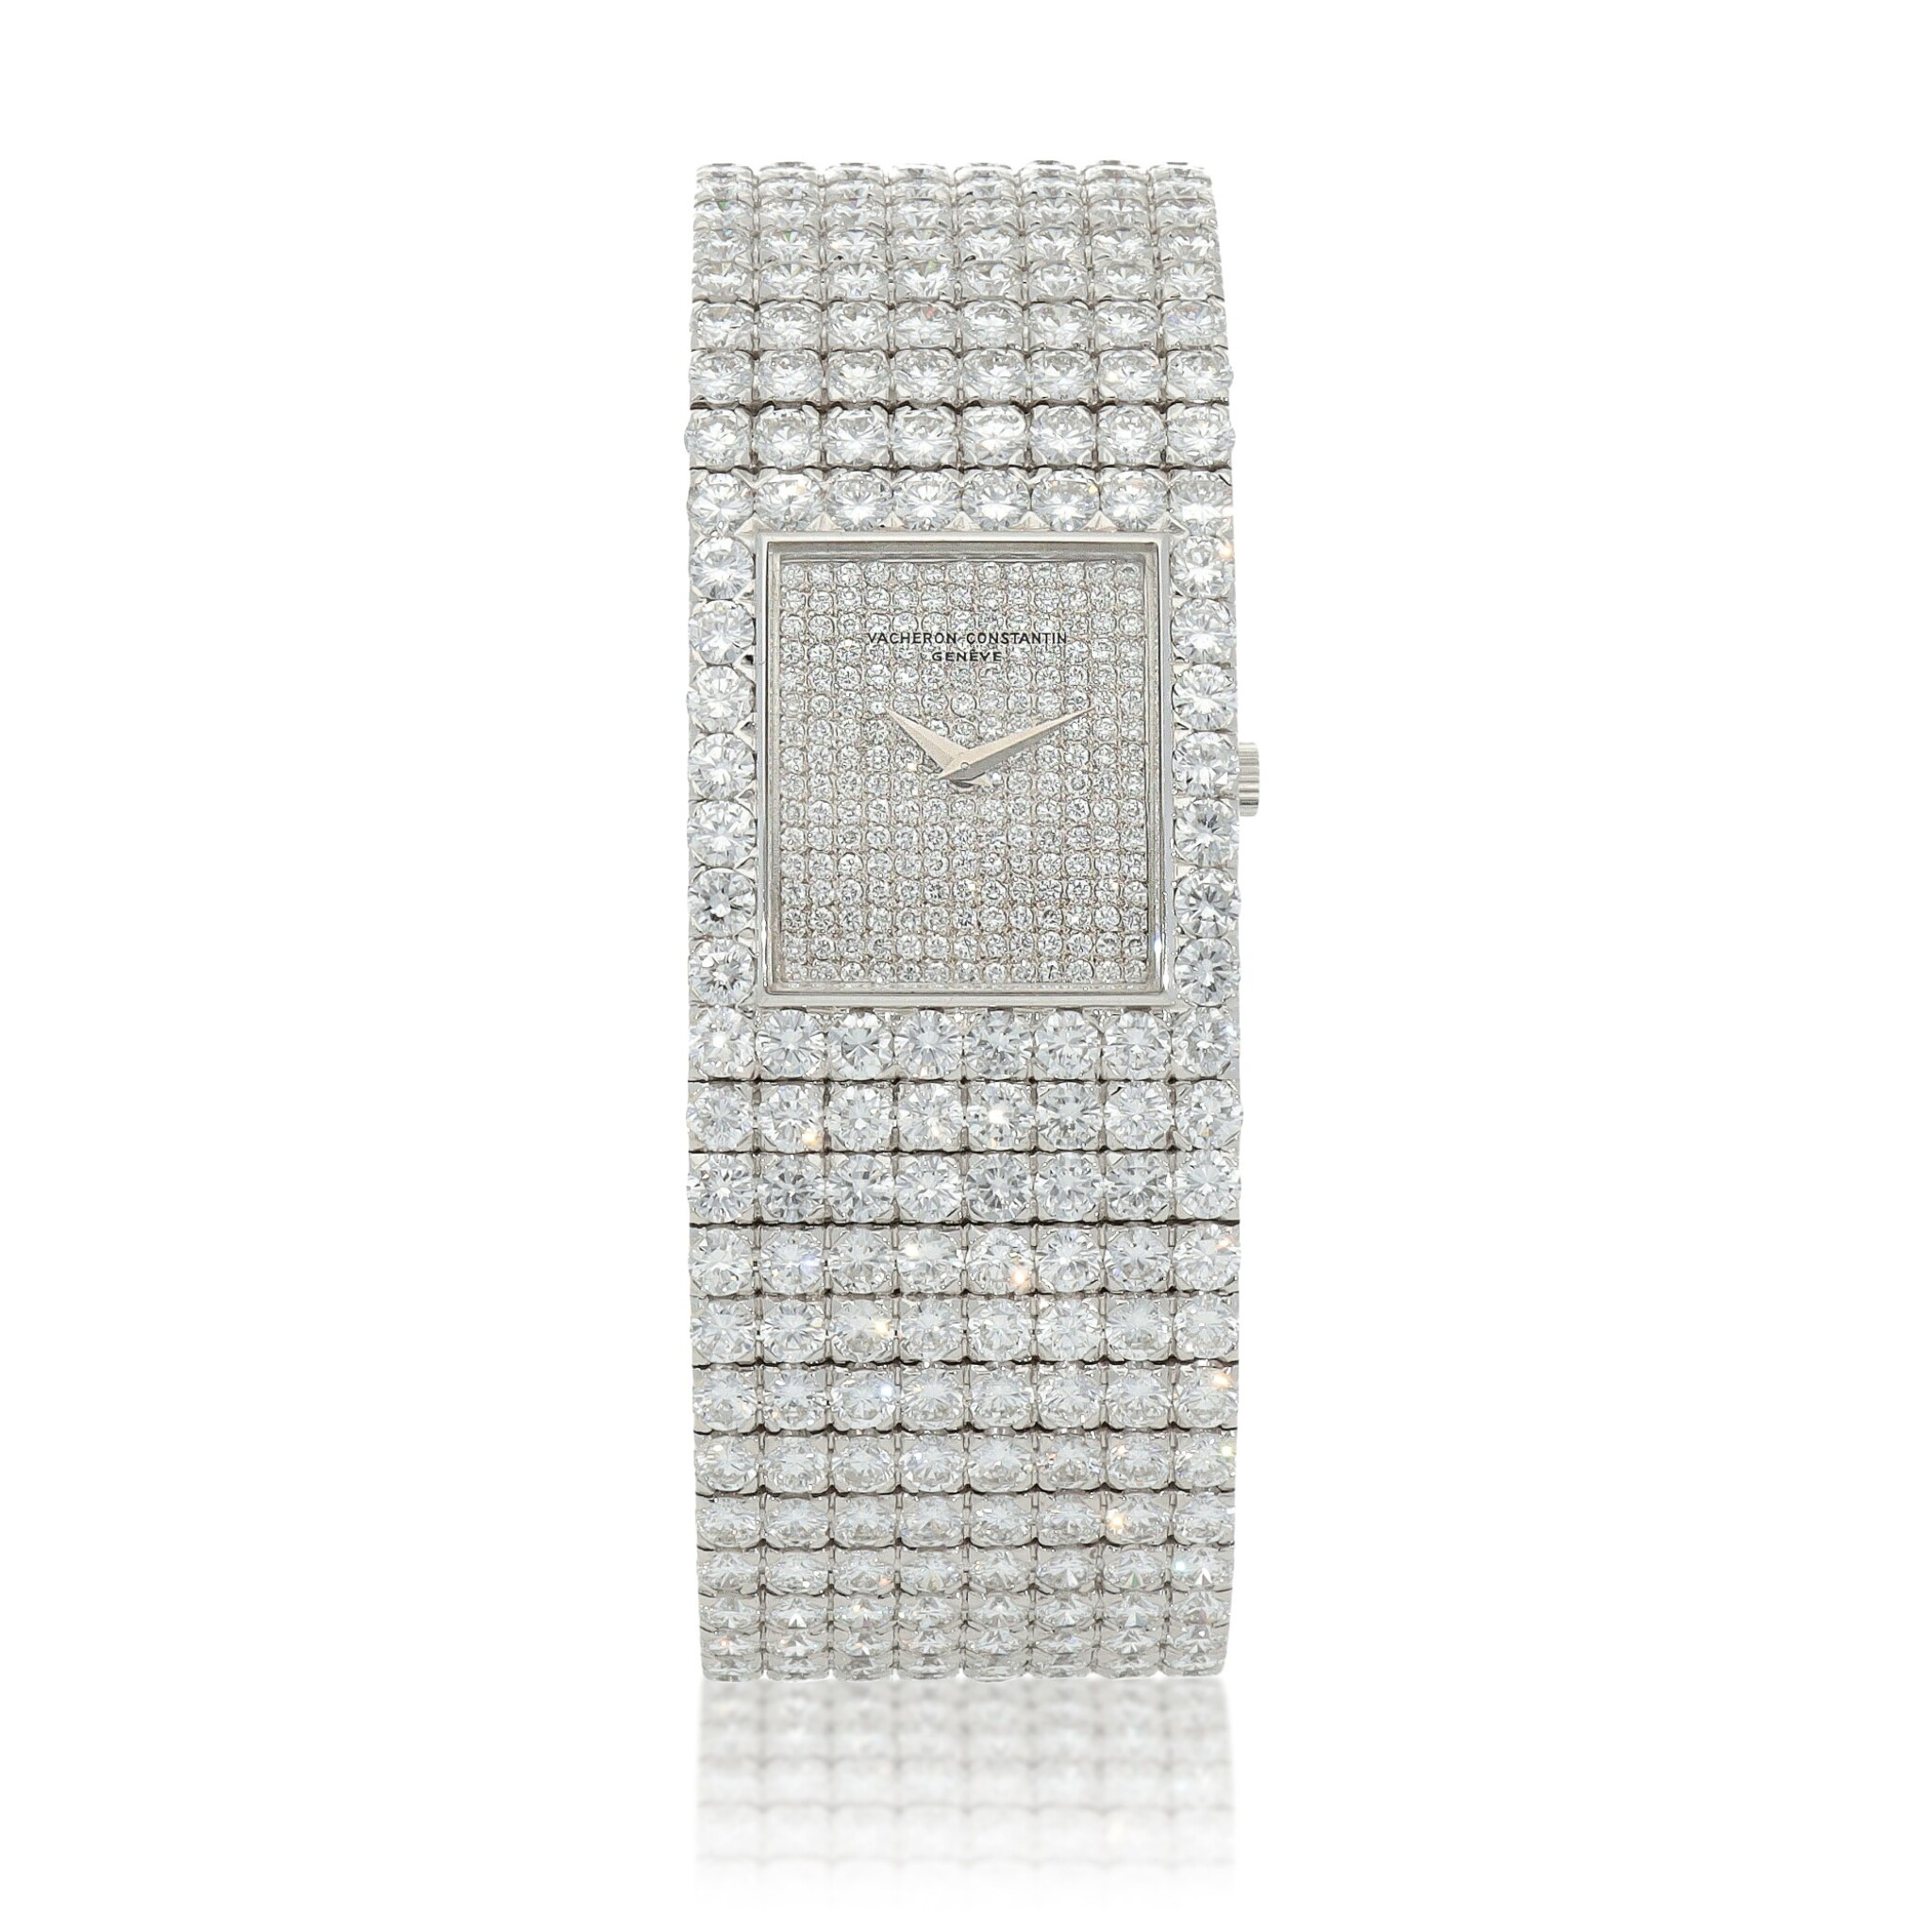 View full screen - View 1 of Lot 60. Kalla, Ref. 35704-707G White gold and diamond-set bracelet watch Made in 1990 | 江詩丹頓35704-707G型號「Kalla」白金鑲鑽石鍊帶腕錶,1990年製.